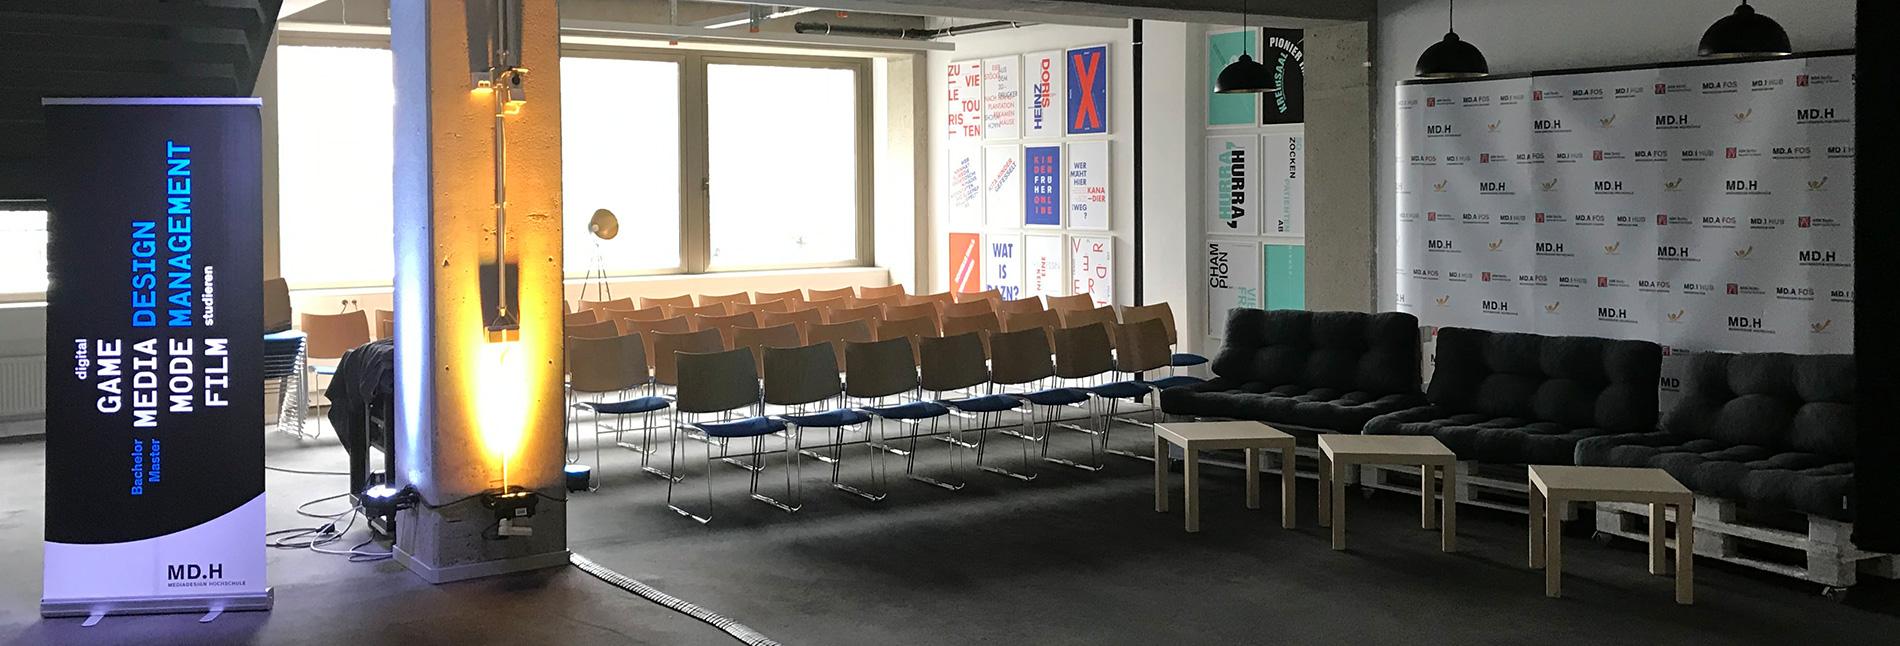 Hörsaal am Berliner Standort